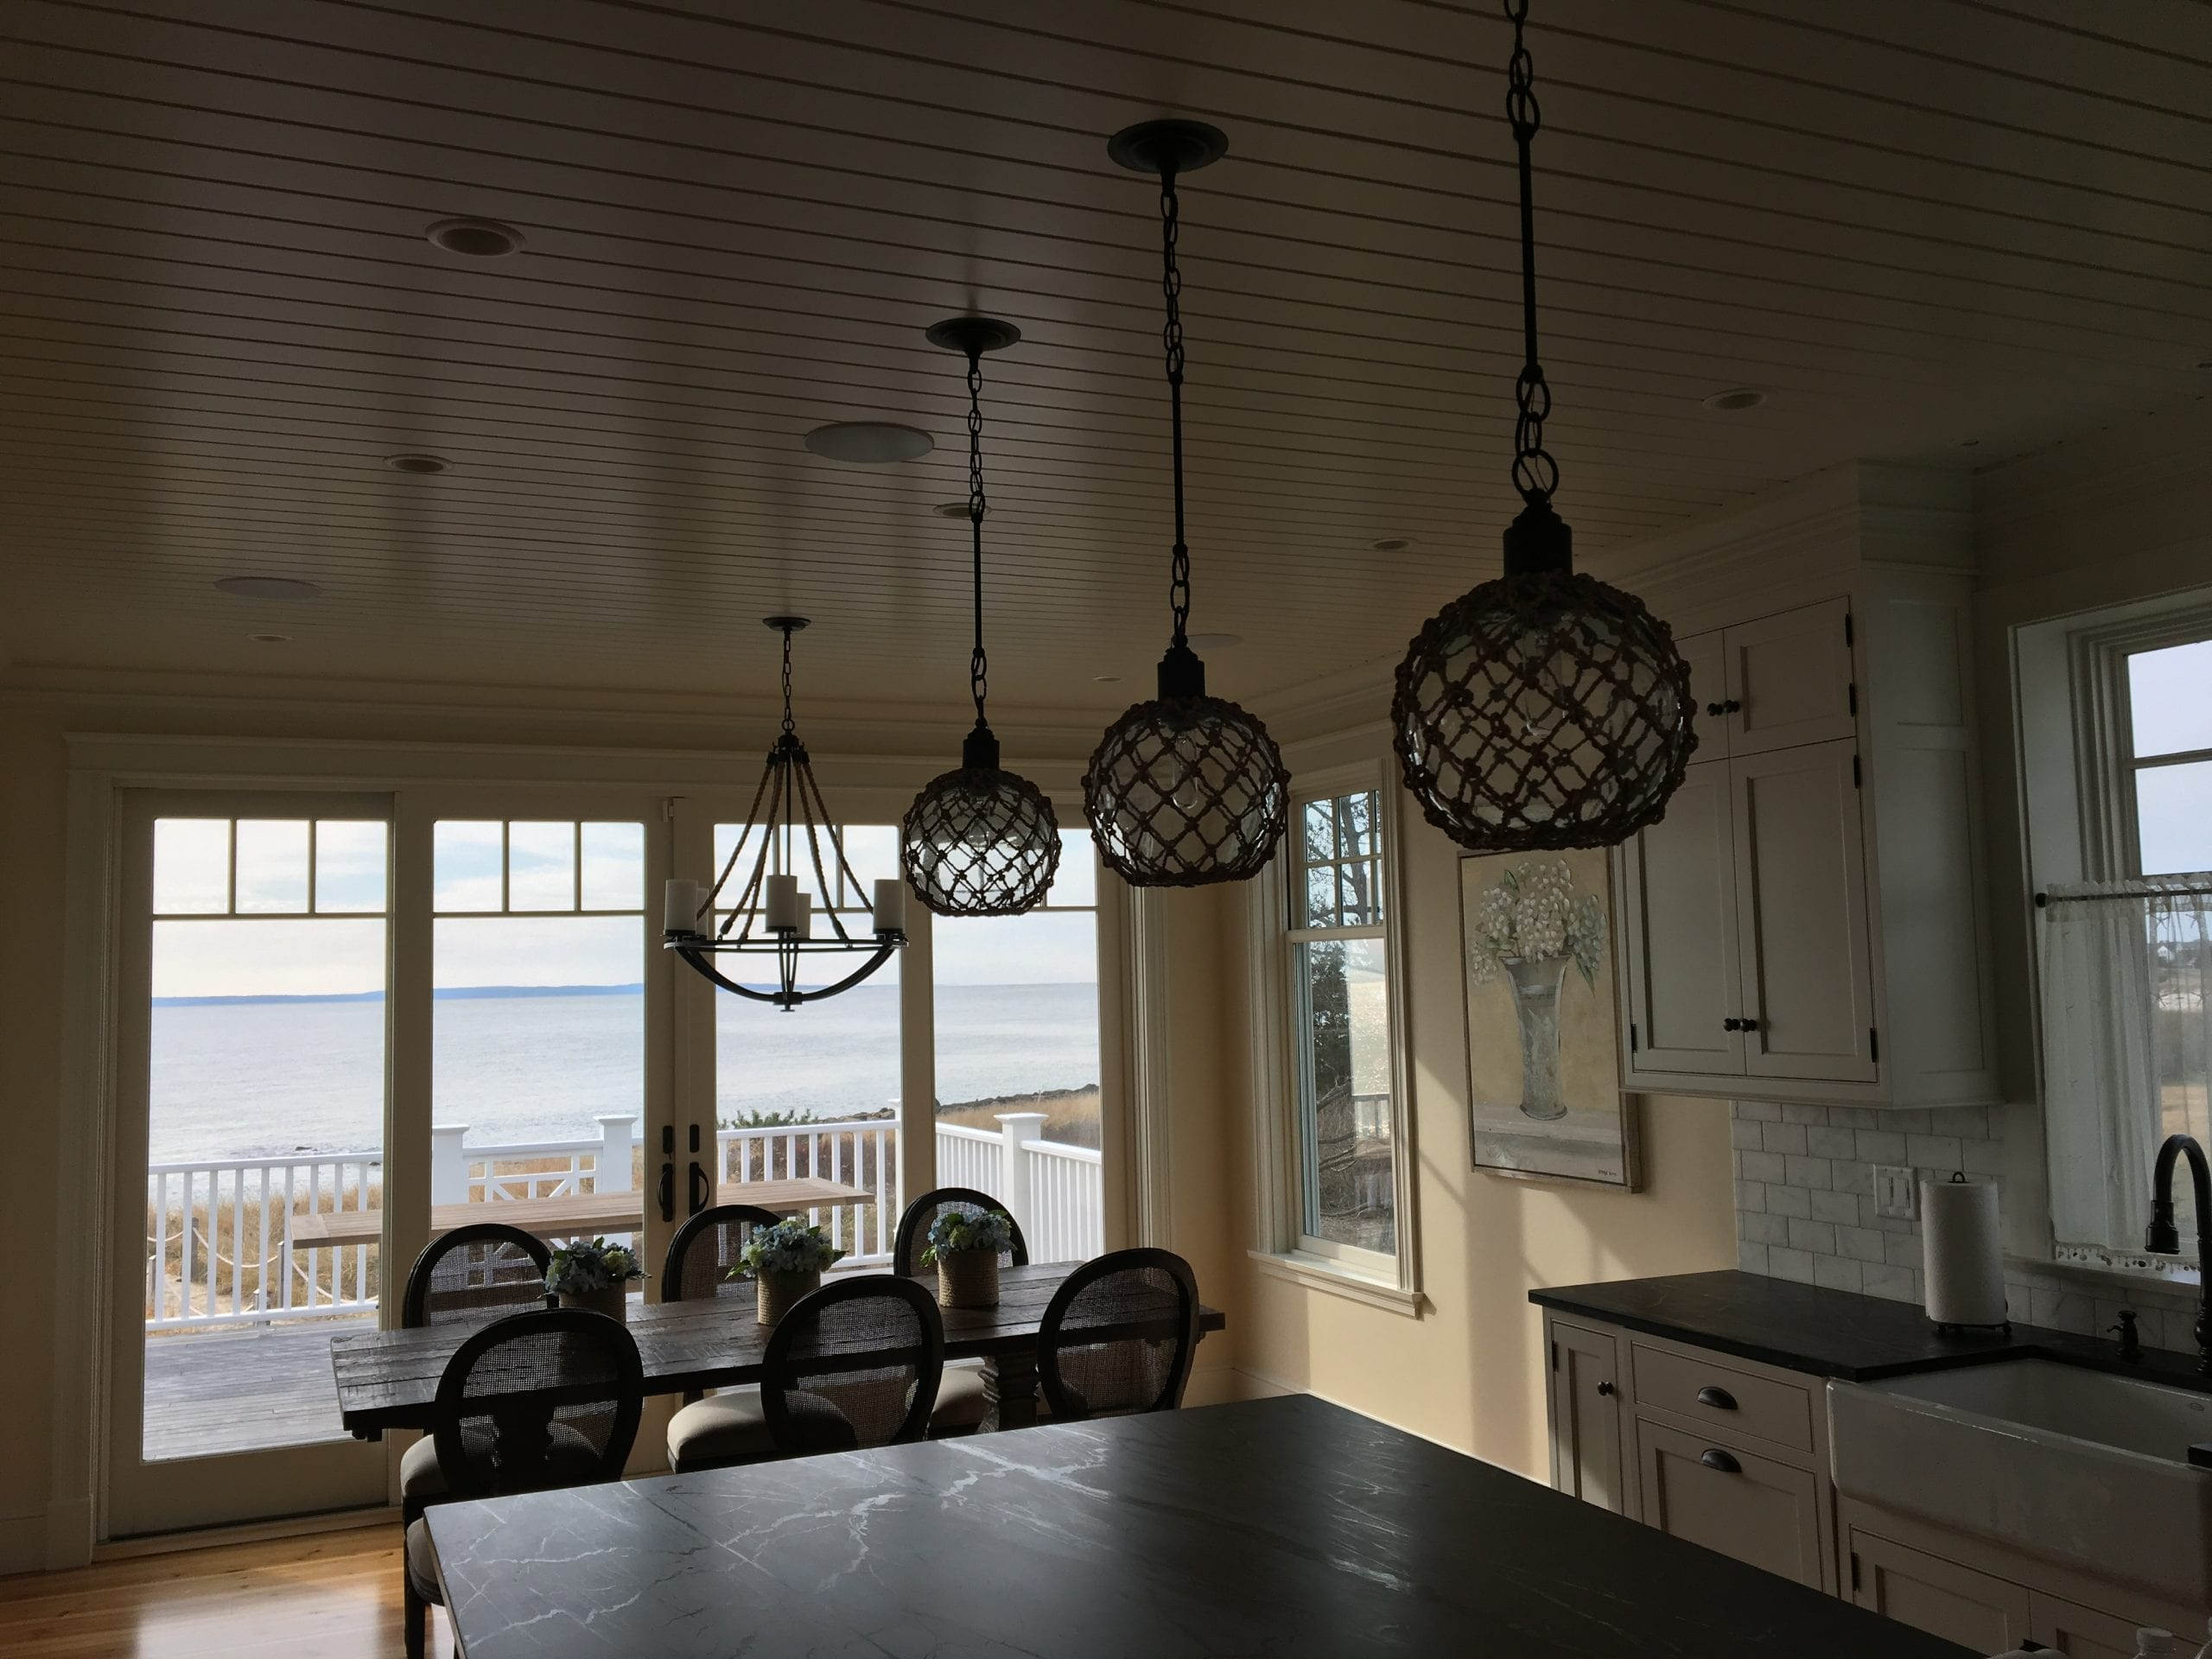 Decorative Custom Nautical Light Fixtures